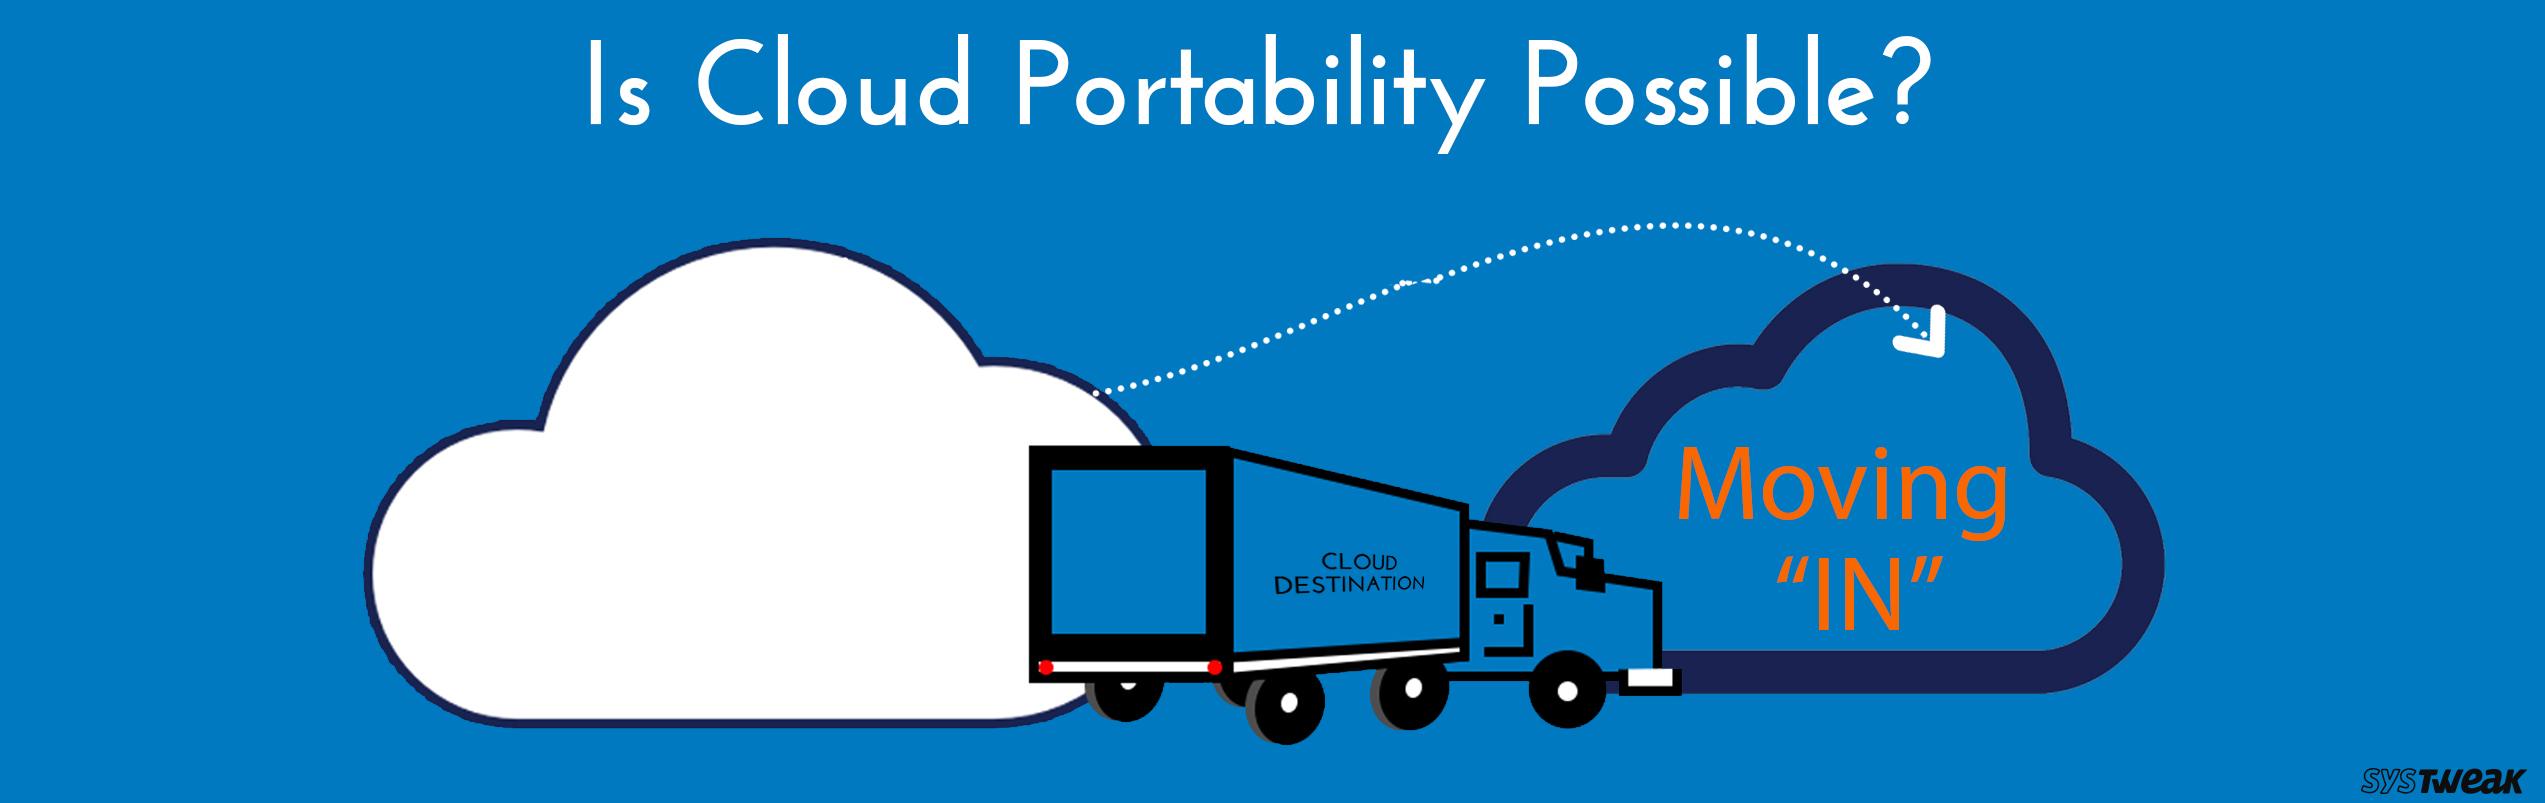 Will We Ever Reach Cloud Portability?